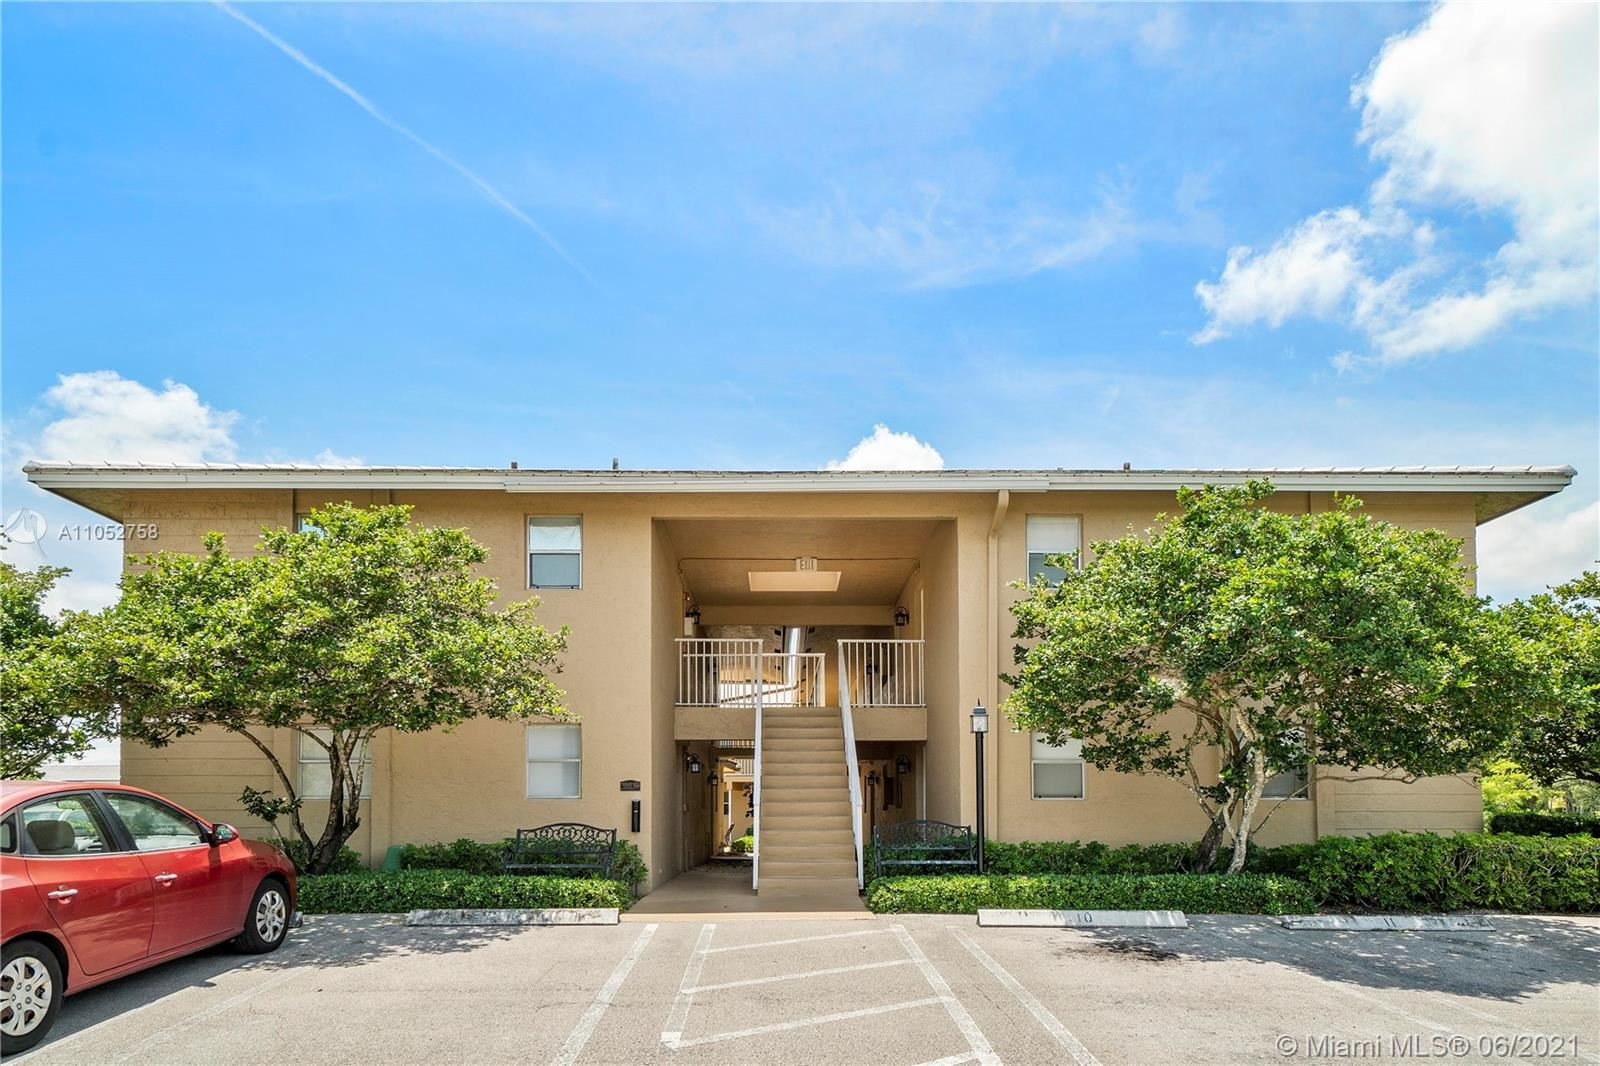 3800 N University Dr #3800, Coral Springs, FL 33065 - #: A11052758